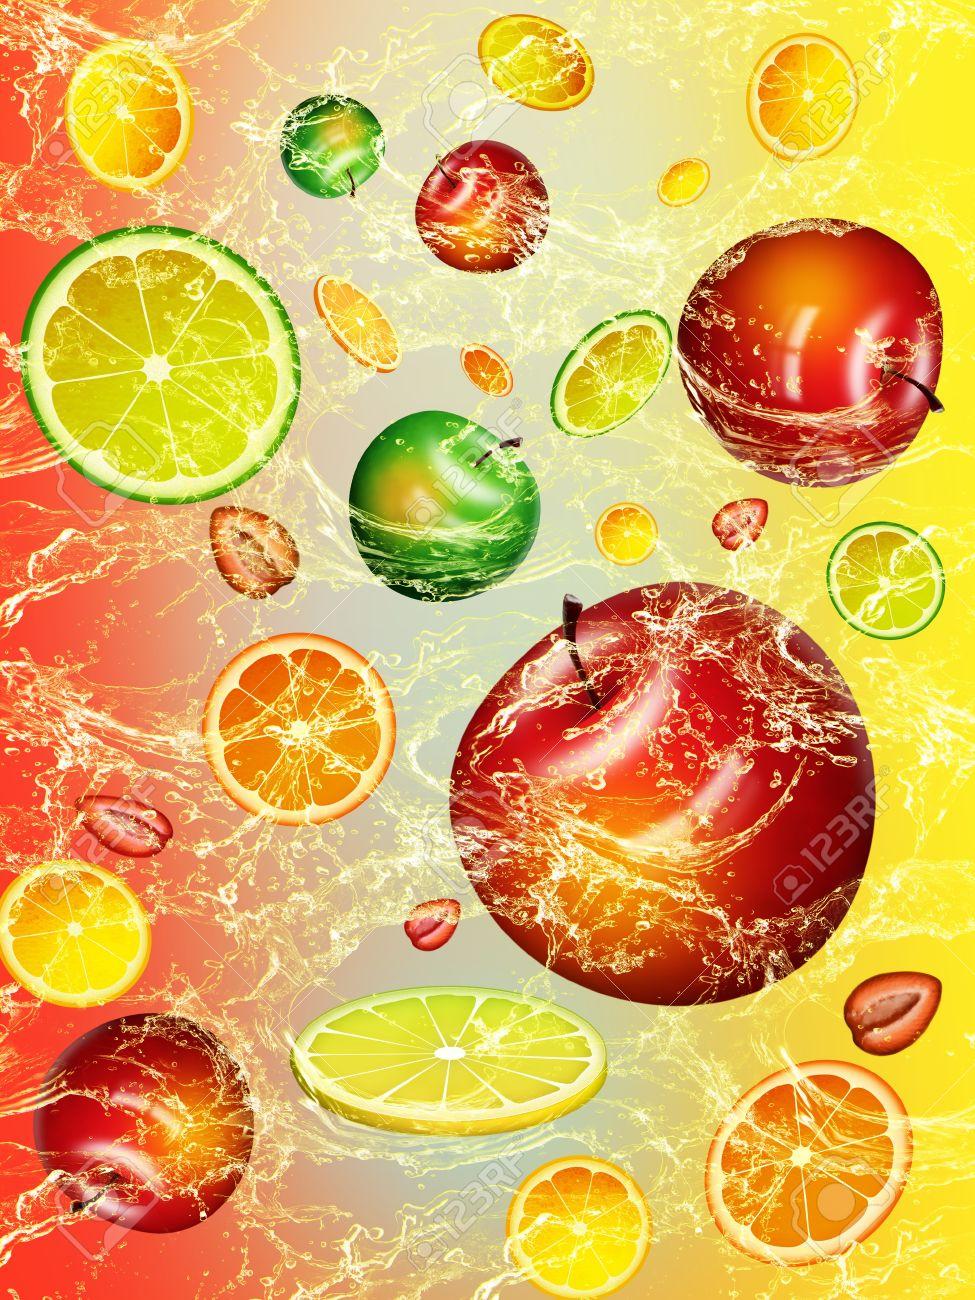 Fresh fruit wallpaper - Wallpaper With Fresh Fruit Stock Photo 9970719